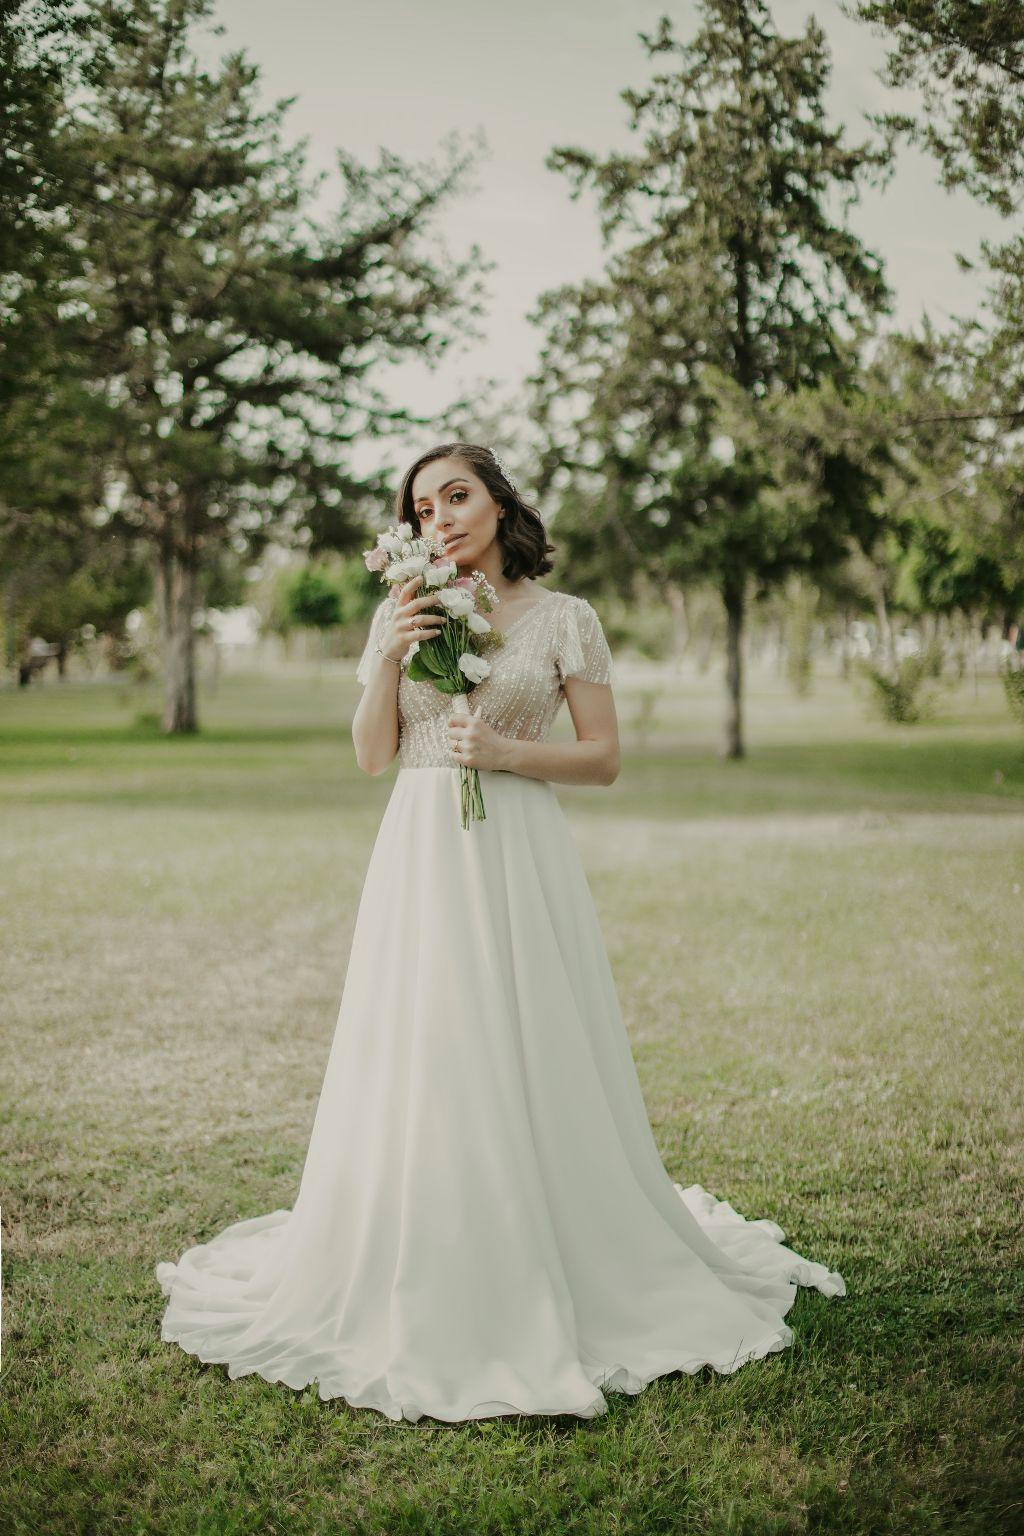 Bride 🥰 #freetoedit #bride #photo #green #wedding #love